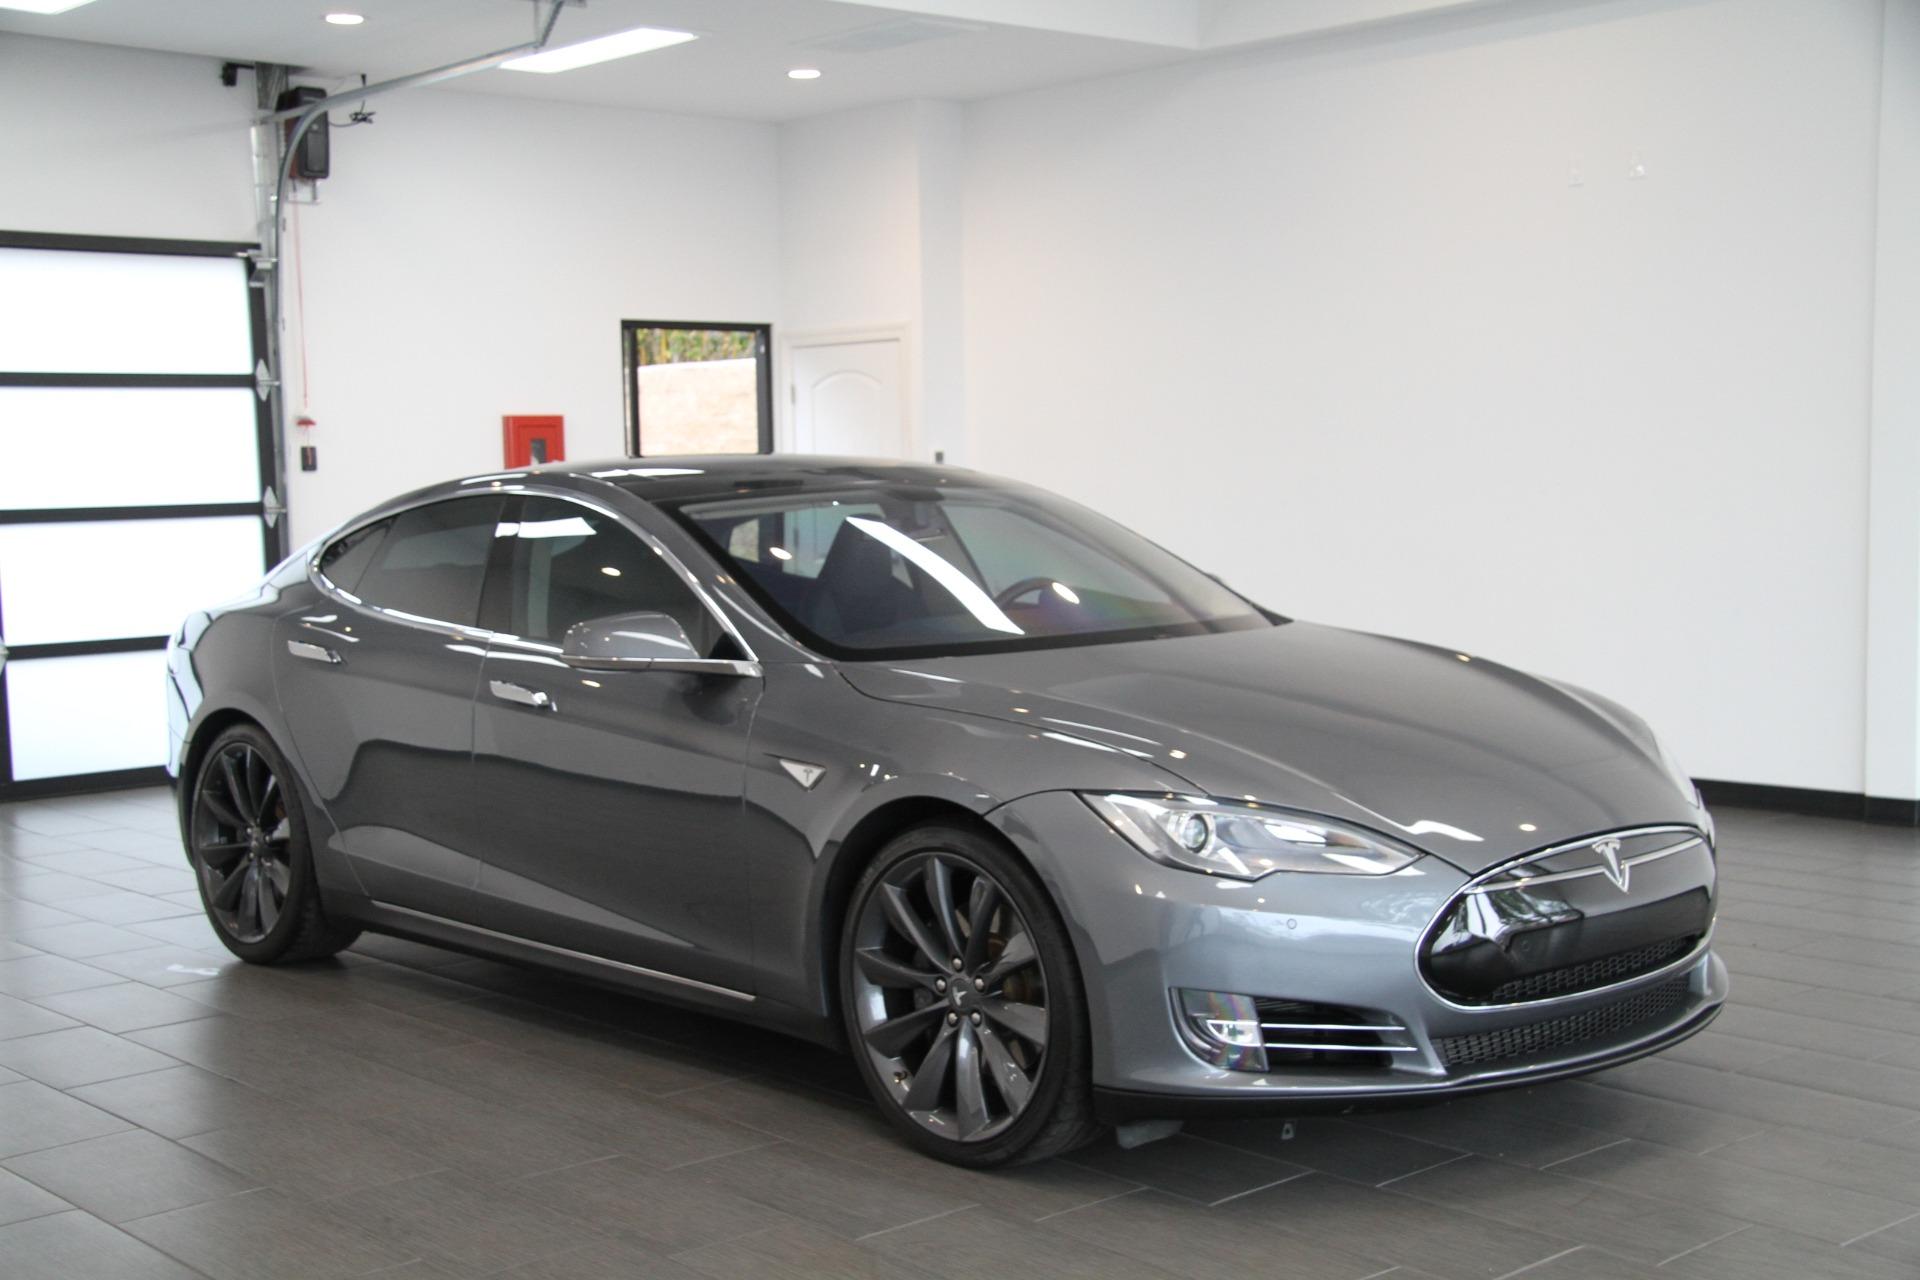 Auto Trade In Value >> 2013 Tesla Model S P85 Stock # 6095 for sale near Redondo Beach, CA | CA Tesla Dealer